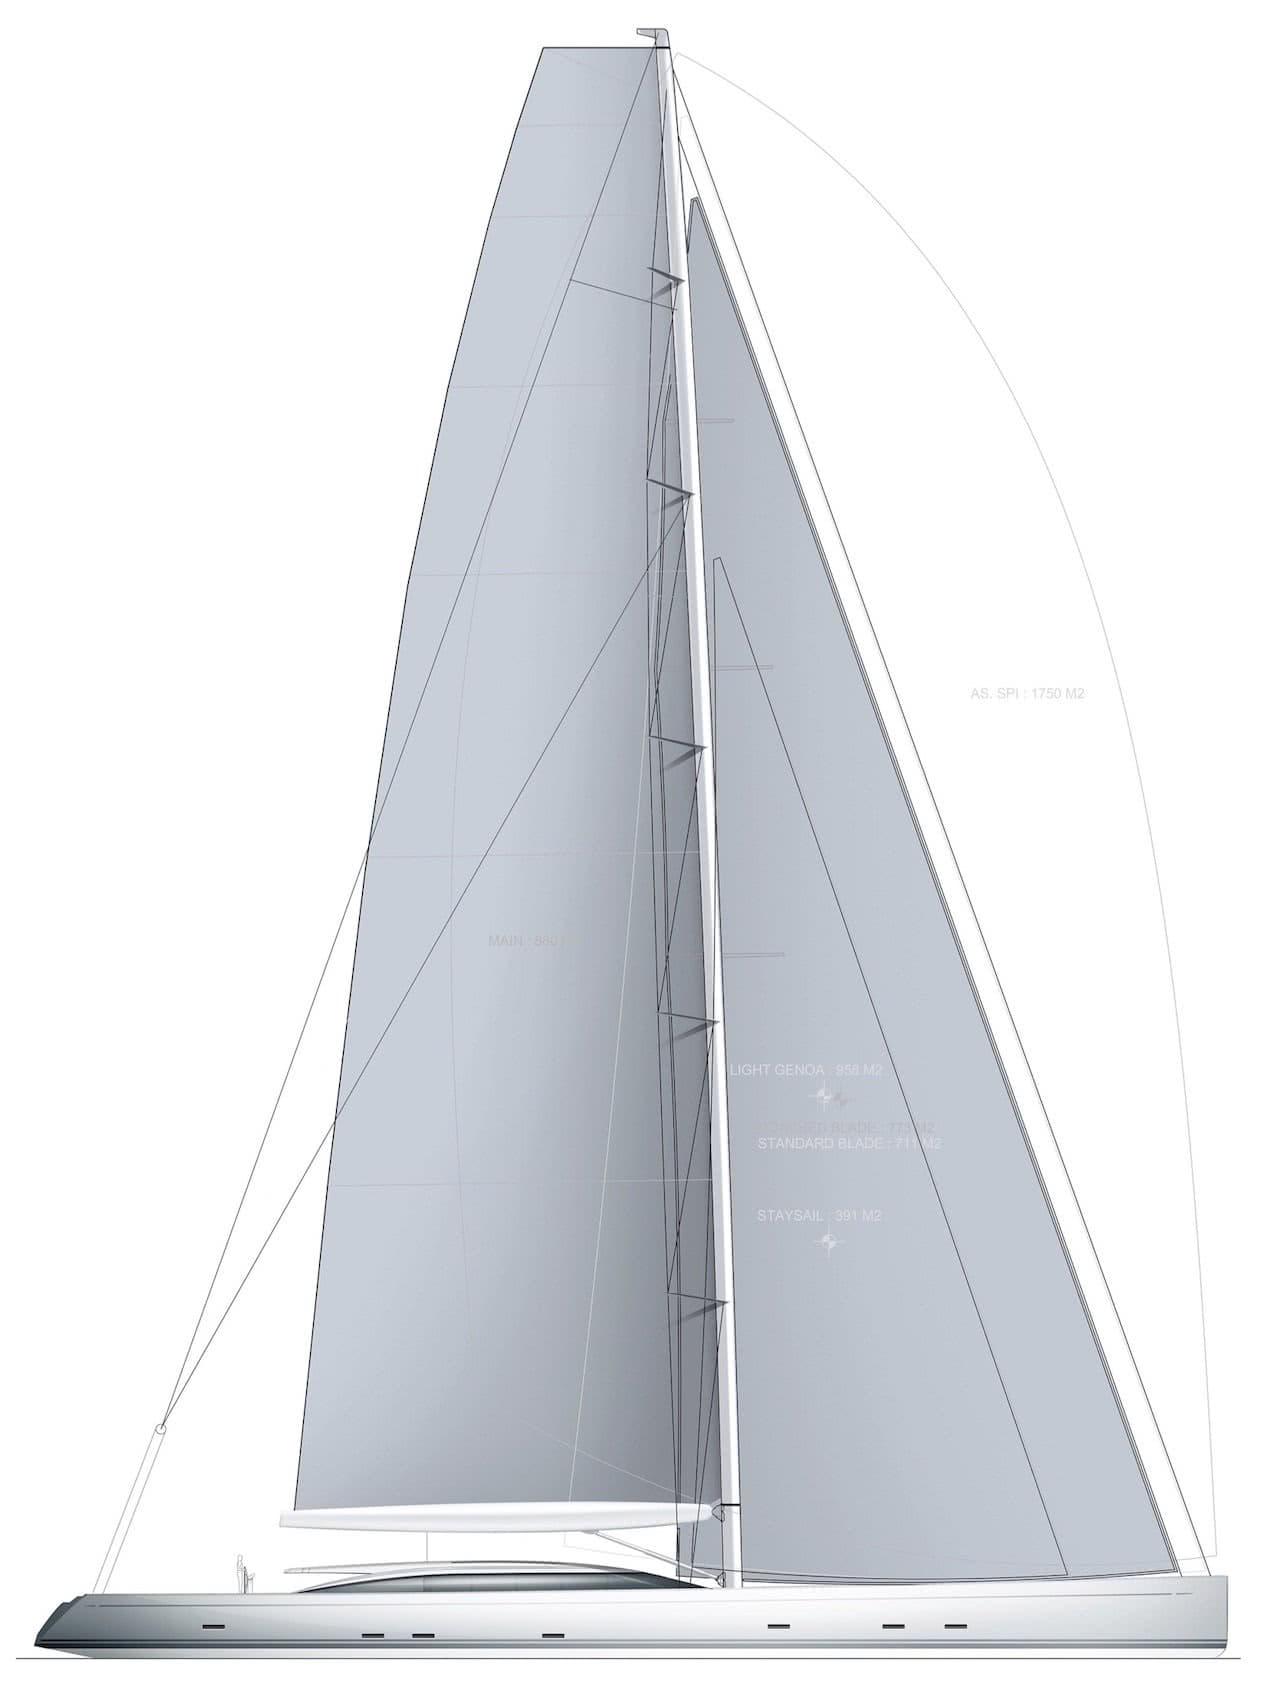 Sail Plan 55m Sloop Philippe Briand